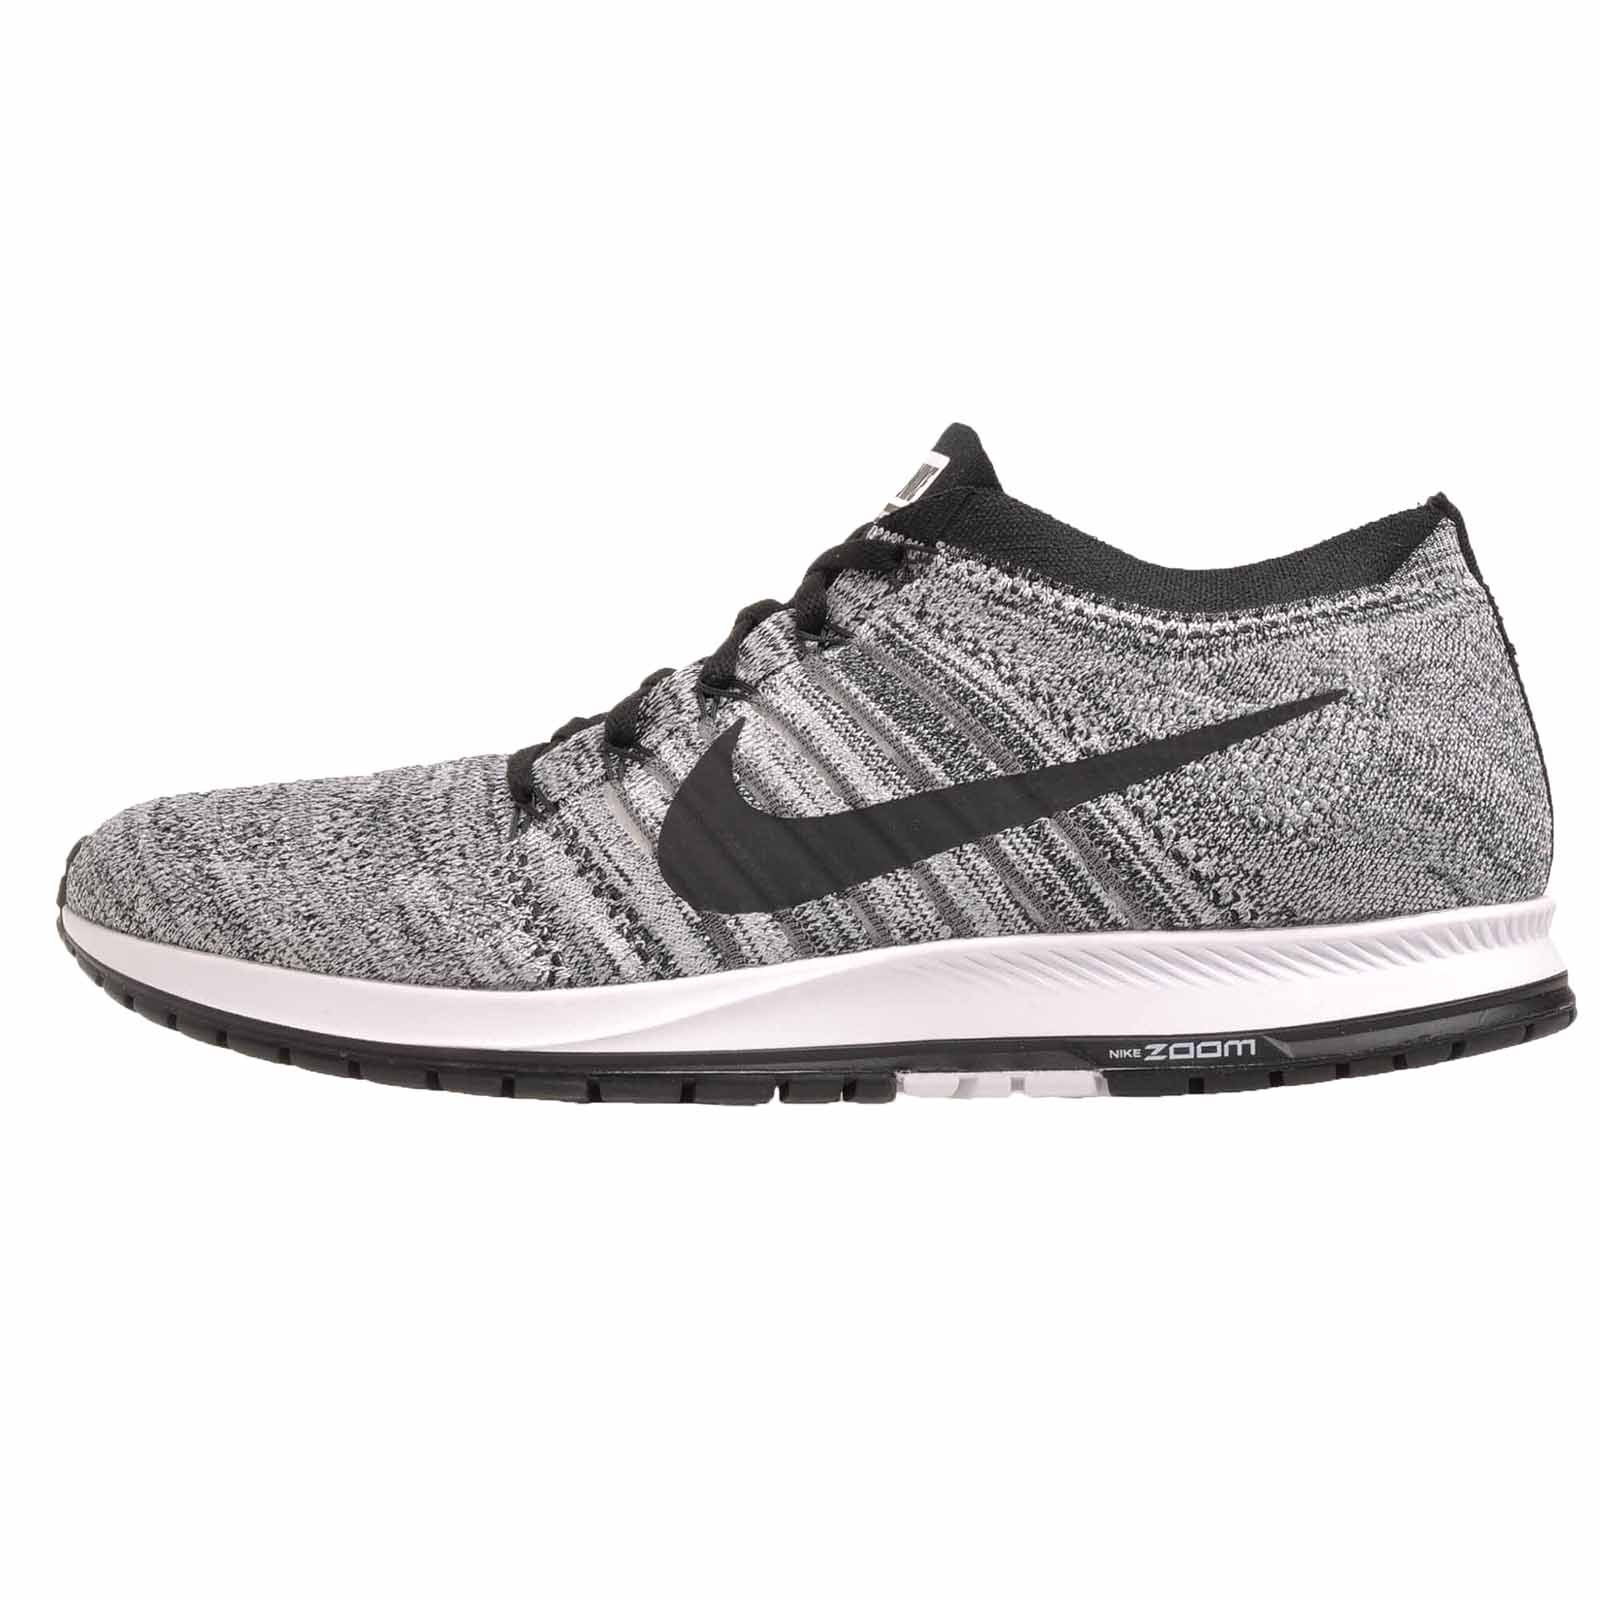 Nike Flyknit Streak Unisex Running Shoes BlackBlack Wolf Grey White 835994 003 (11.5 D(M) US)